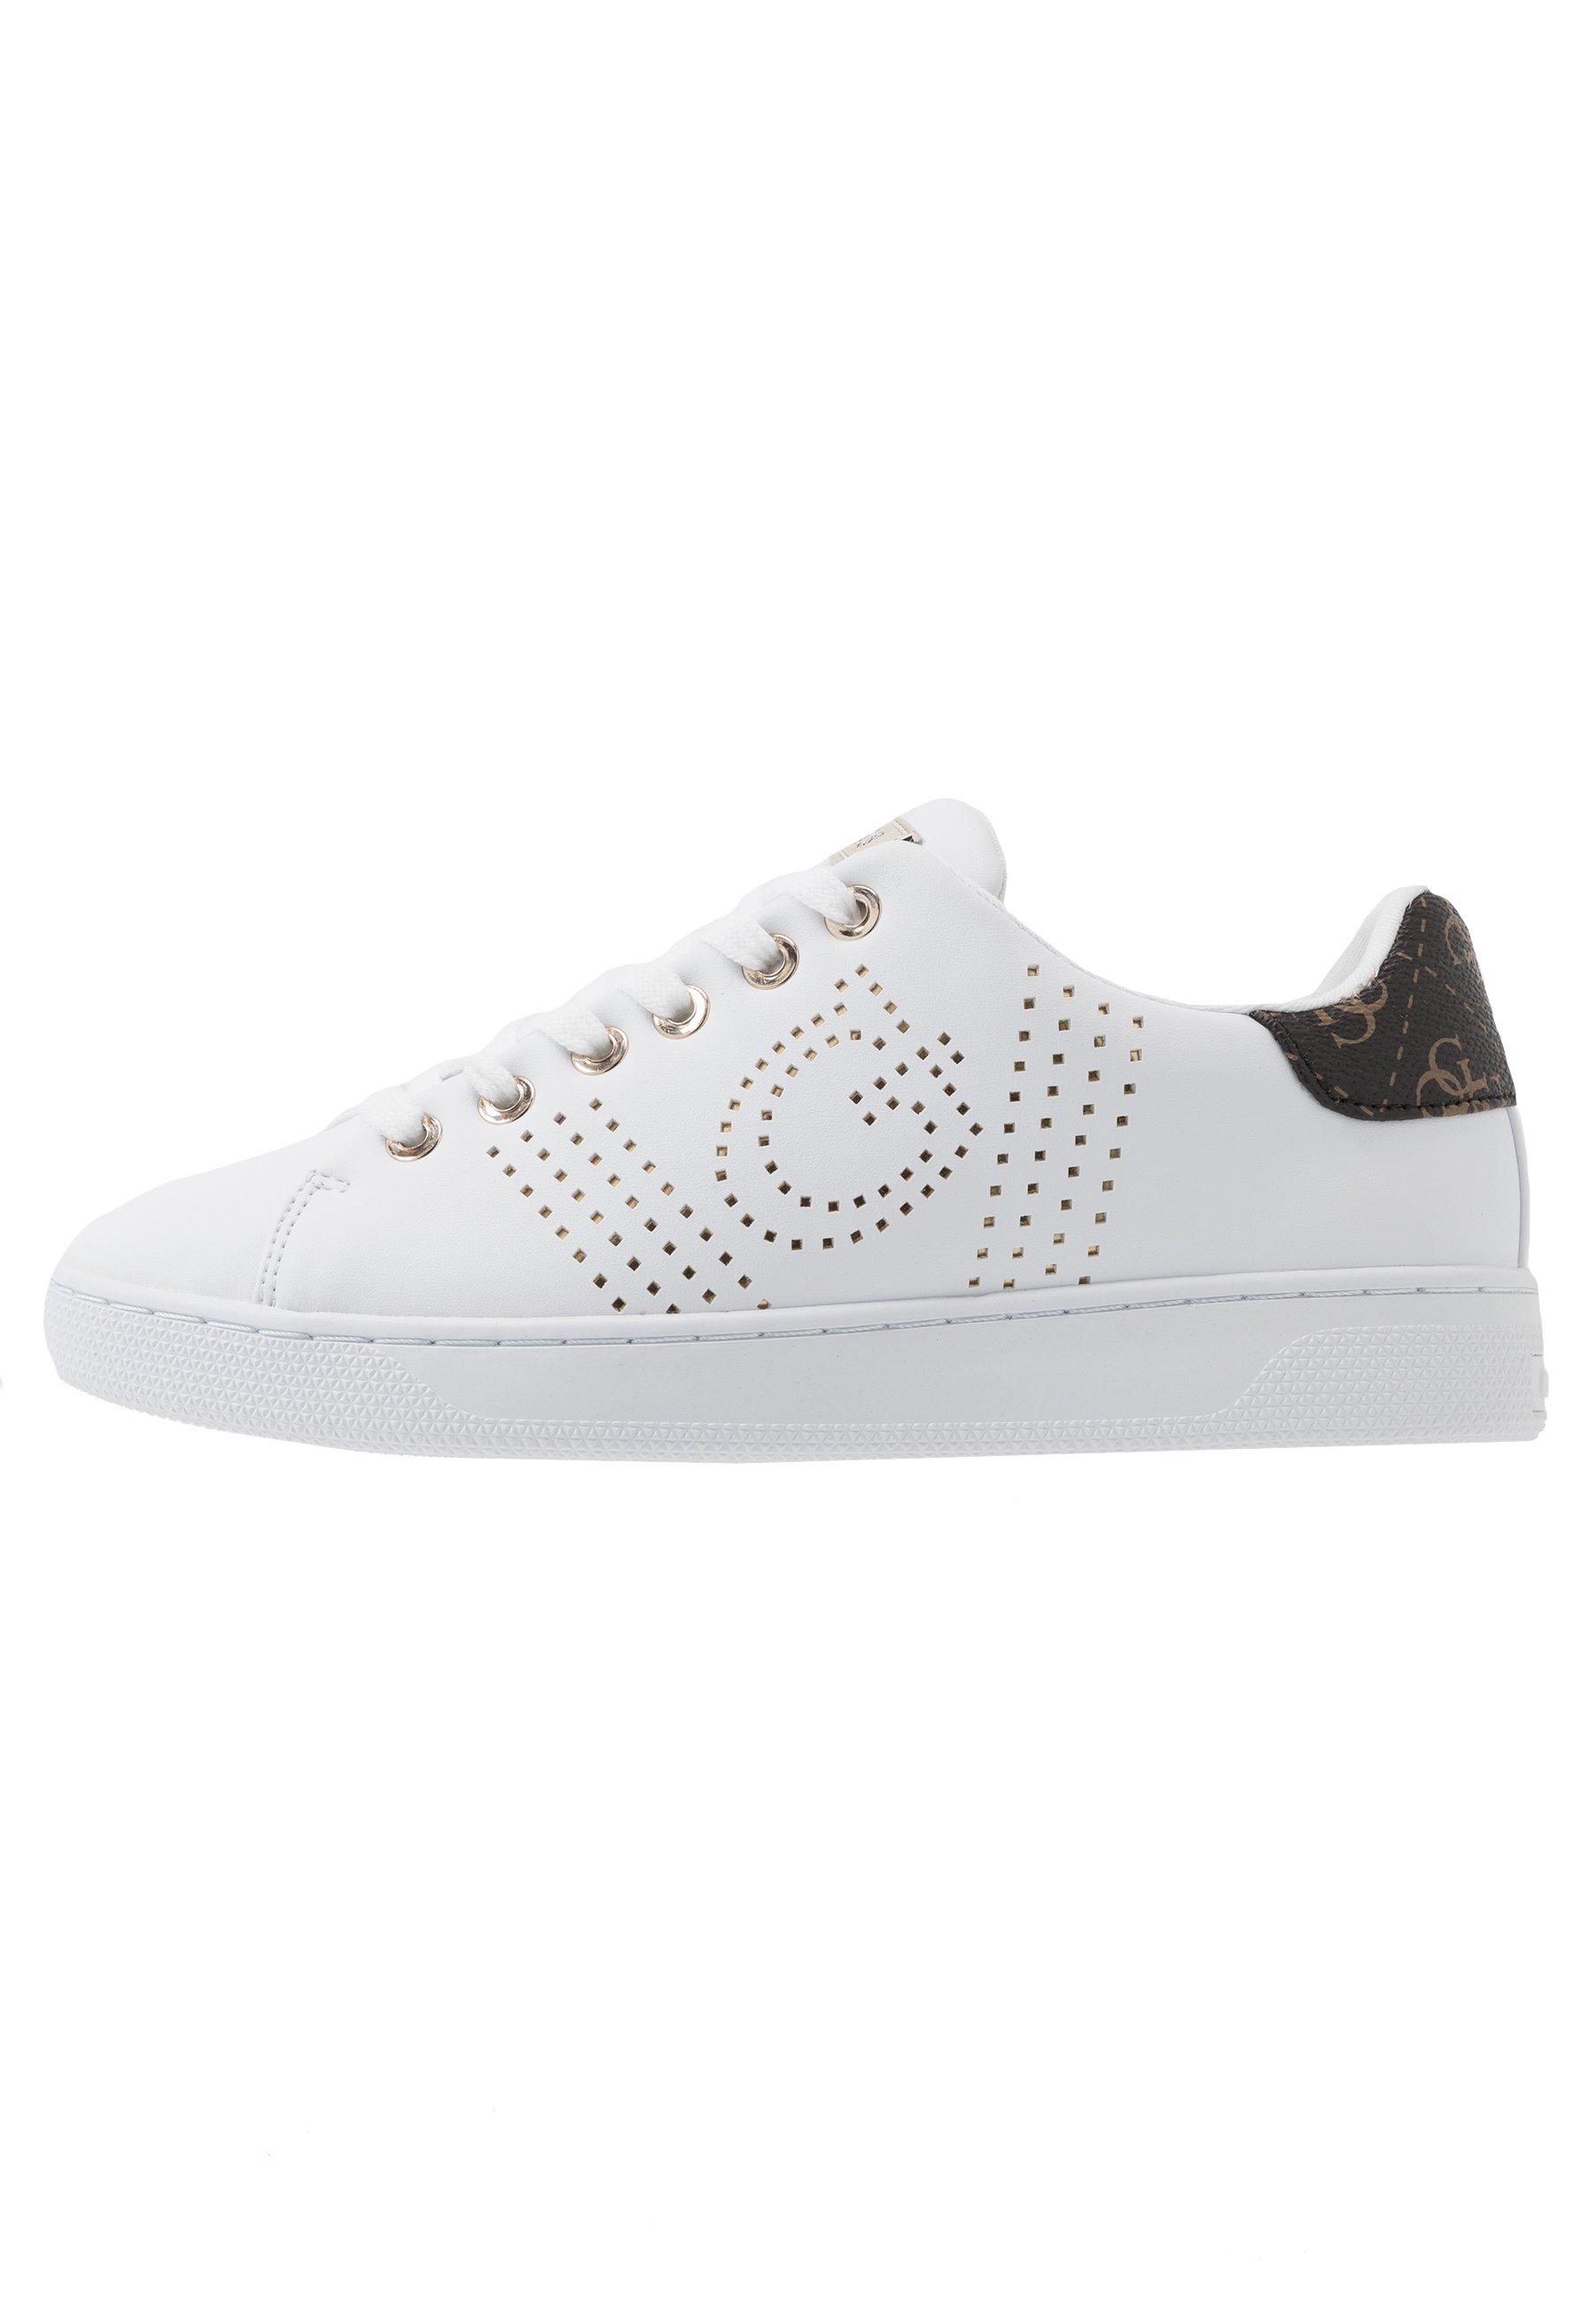 RANVO Sneaker low white